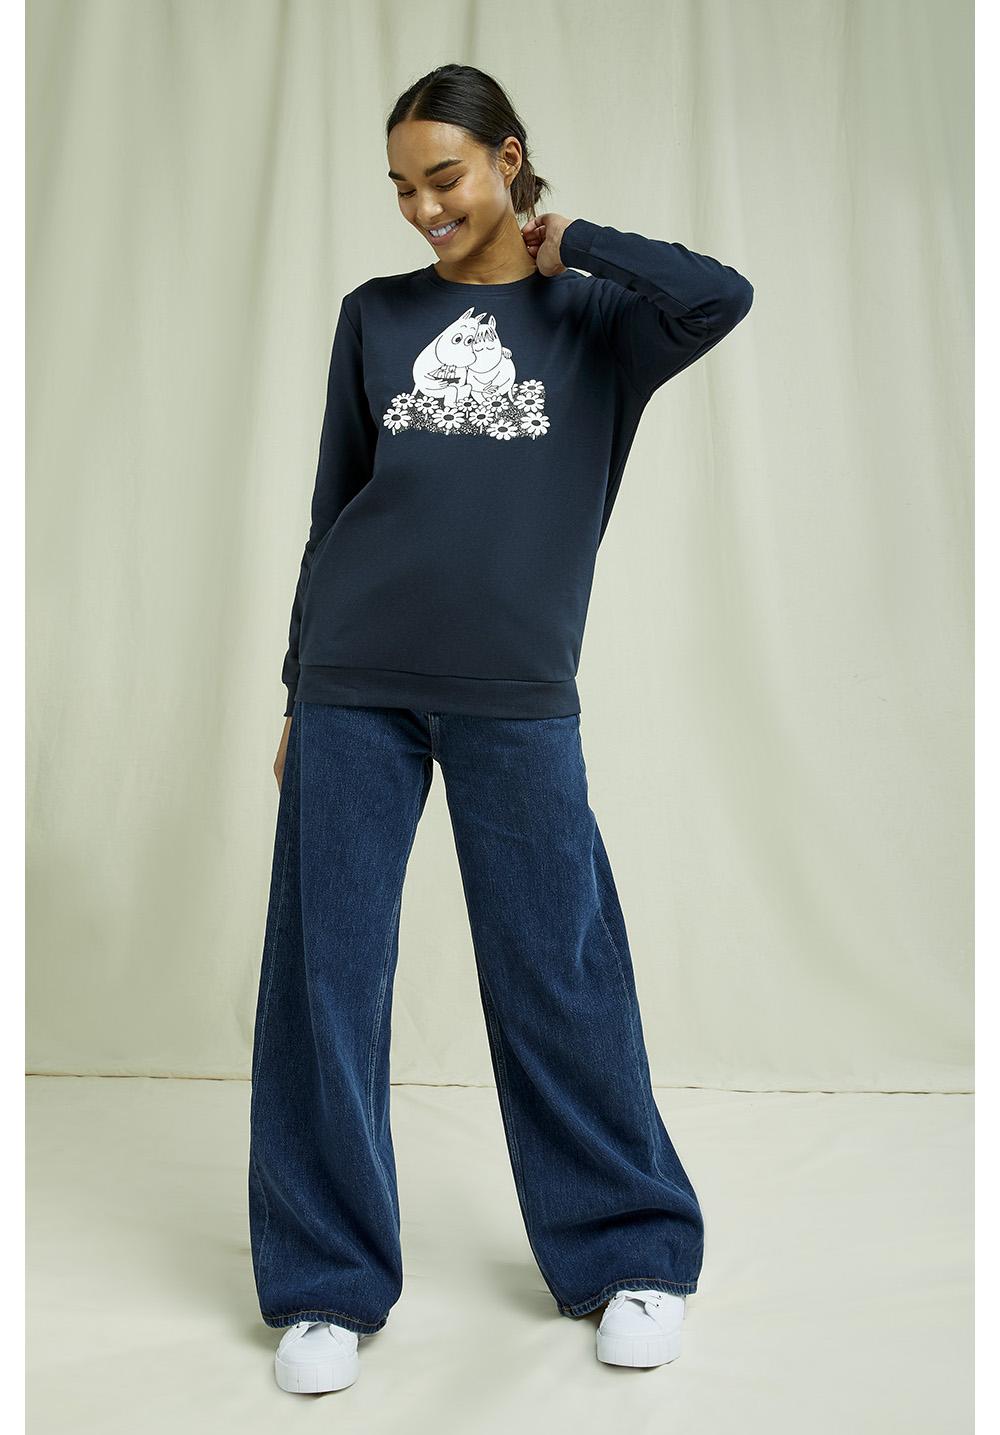 Moomin Sweatshirt In Navy 10